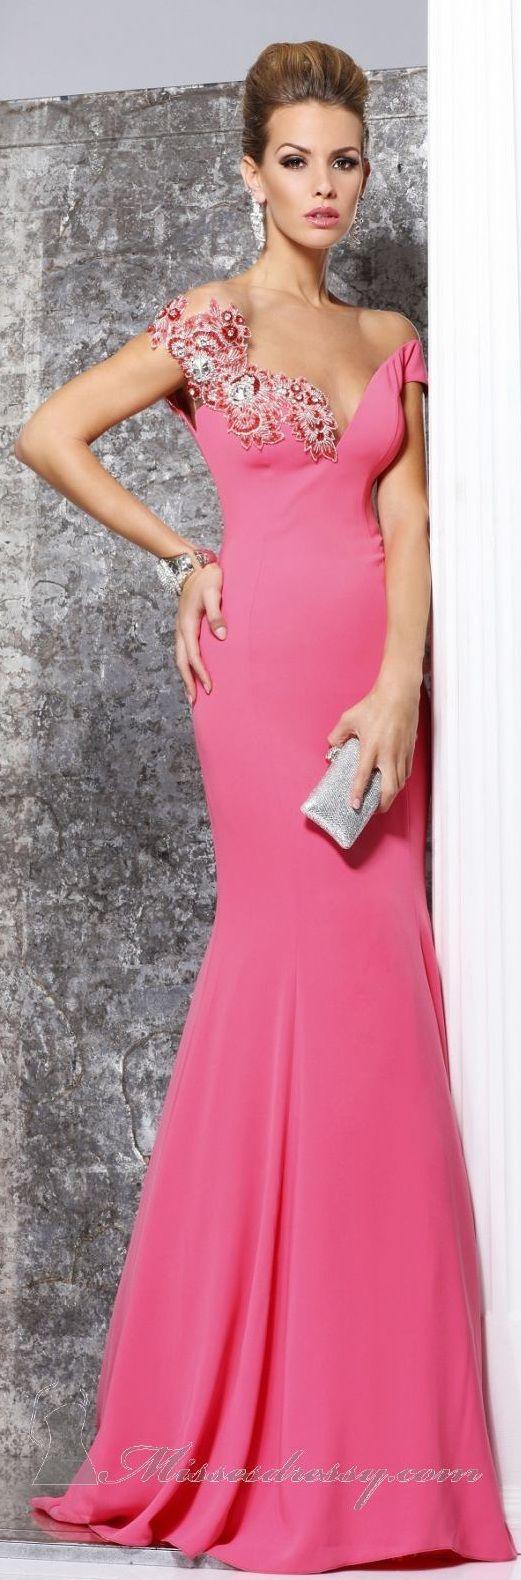 Tarik ediz couture for eventsoccasions pinterest couture